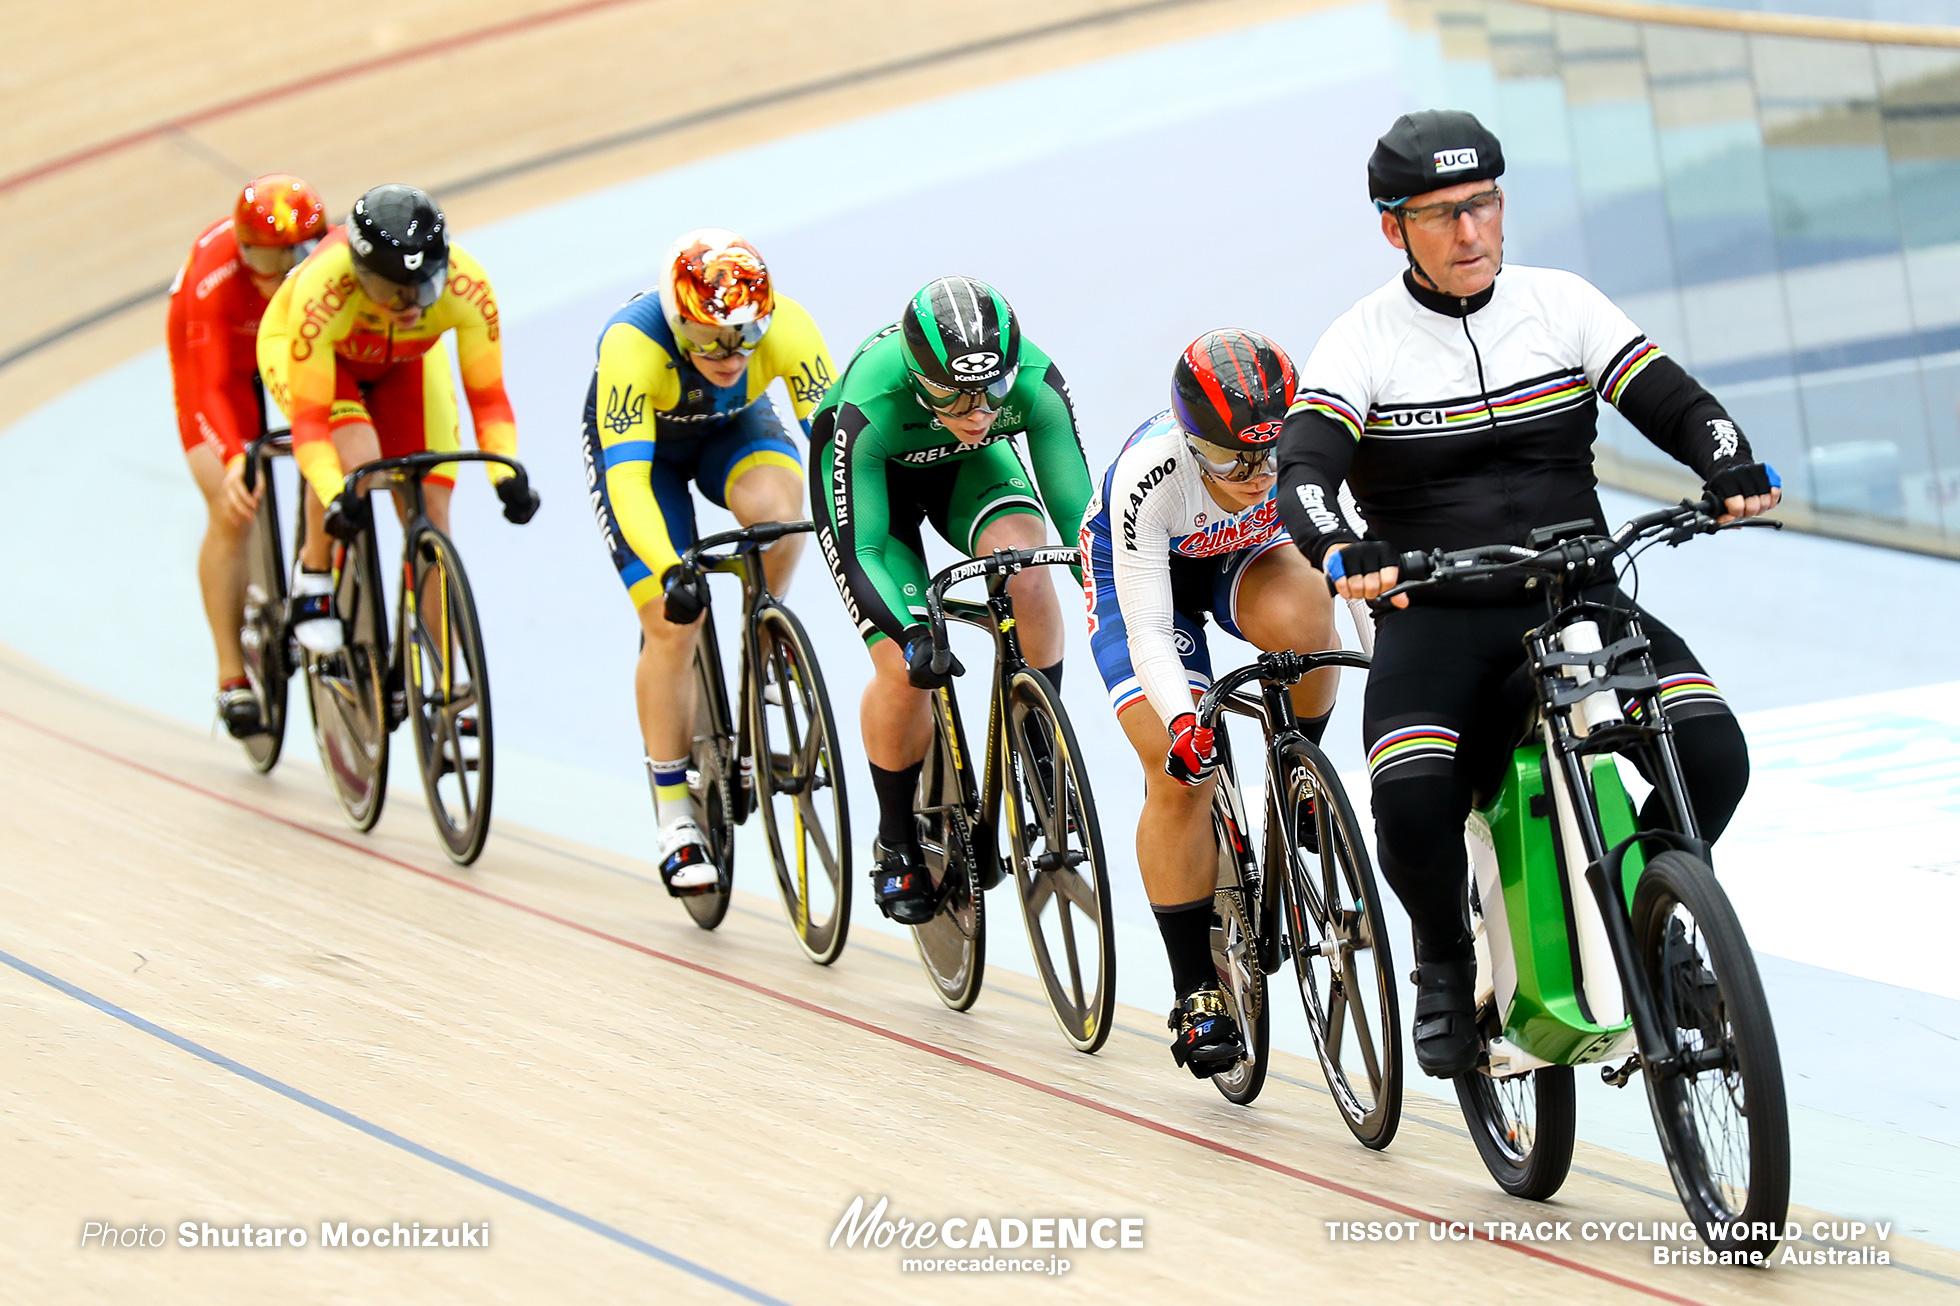 Repechage / Women's Keirin / TISSOT UCI TRACK CYCLING WORLD CUP V, Brisbane, Australia, Liubov BASOVA リウボヴ・バソワ WANG Tzu Chun Helena CASAS ROIGE エレナ・カサス・ロイエ Robyn STEWART ロビン・スチュワート LIN Junhong